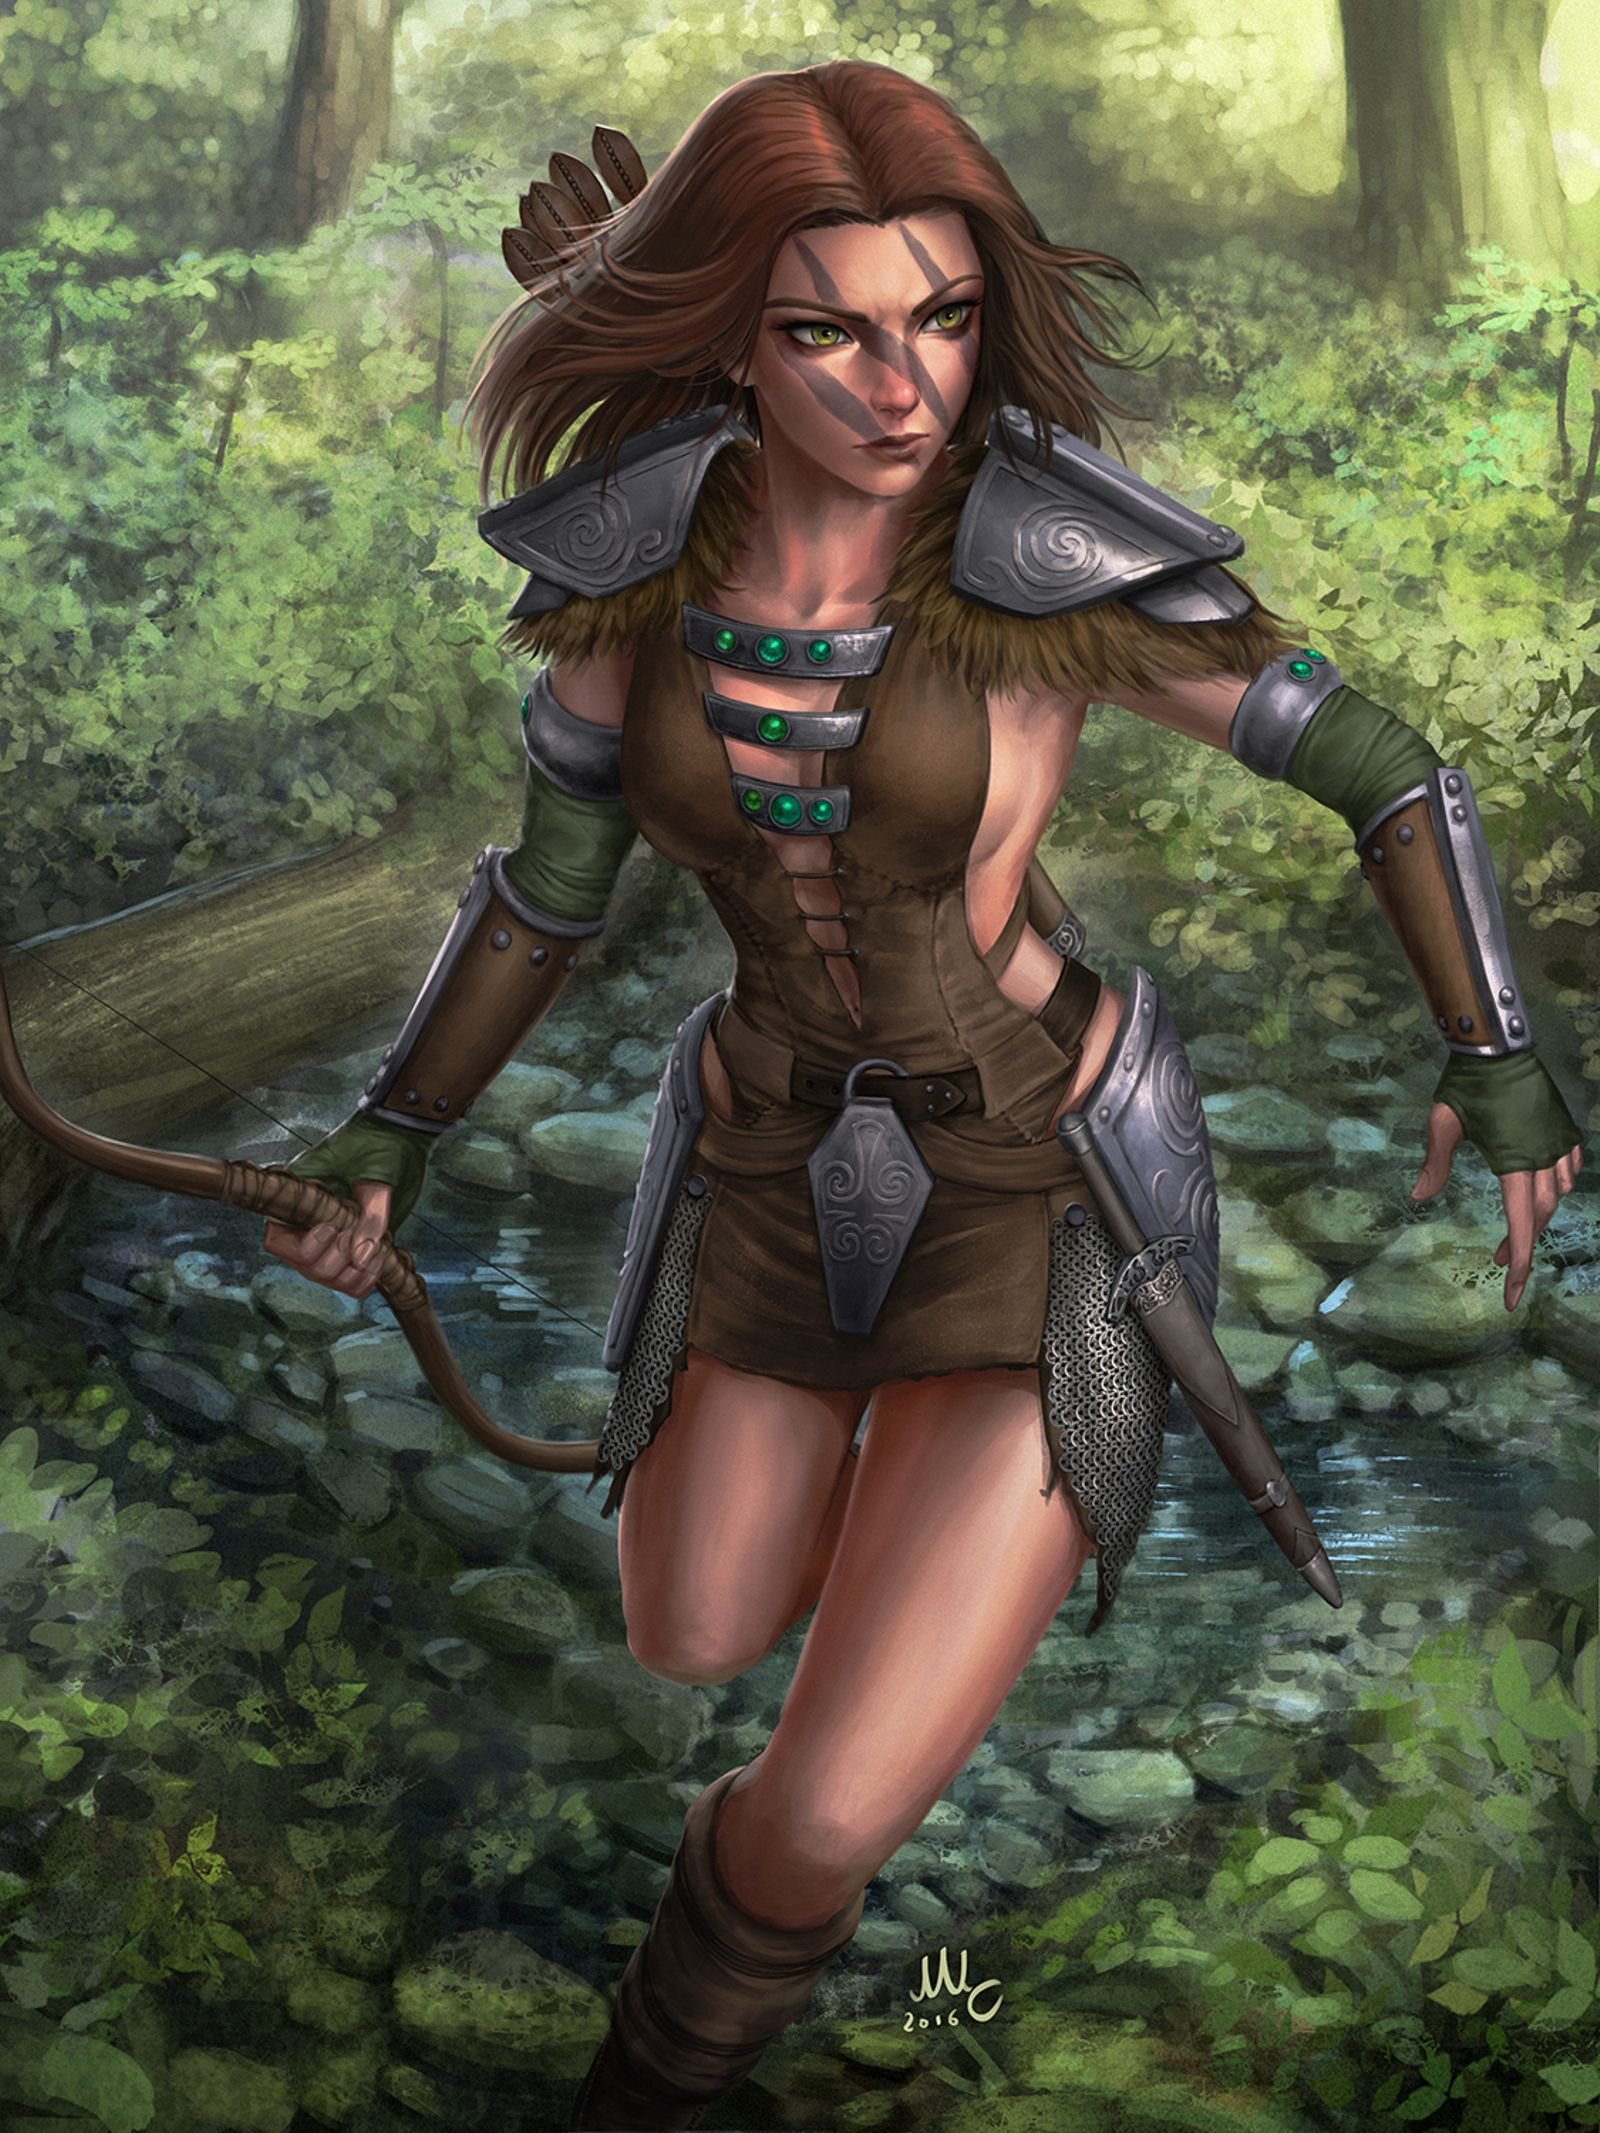 TES 5: Skyrim - Elder Scrolls 5: Skyrim, the Арт